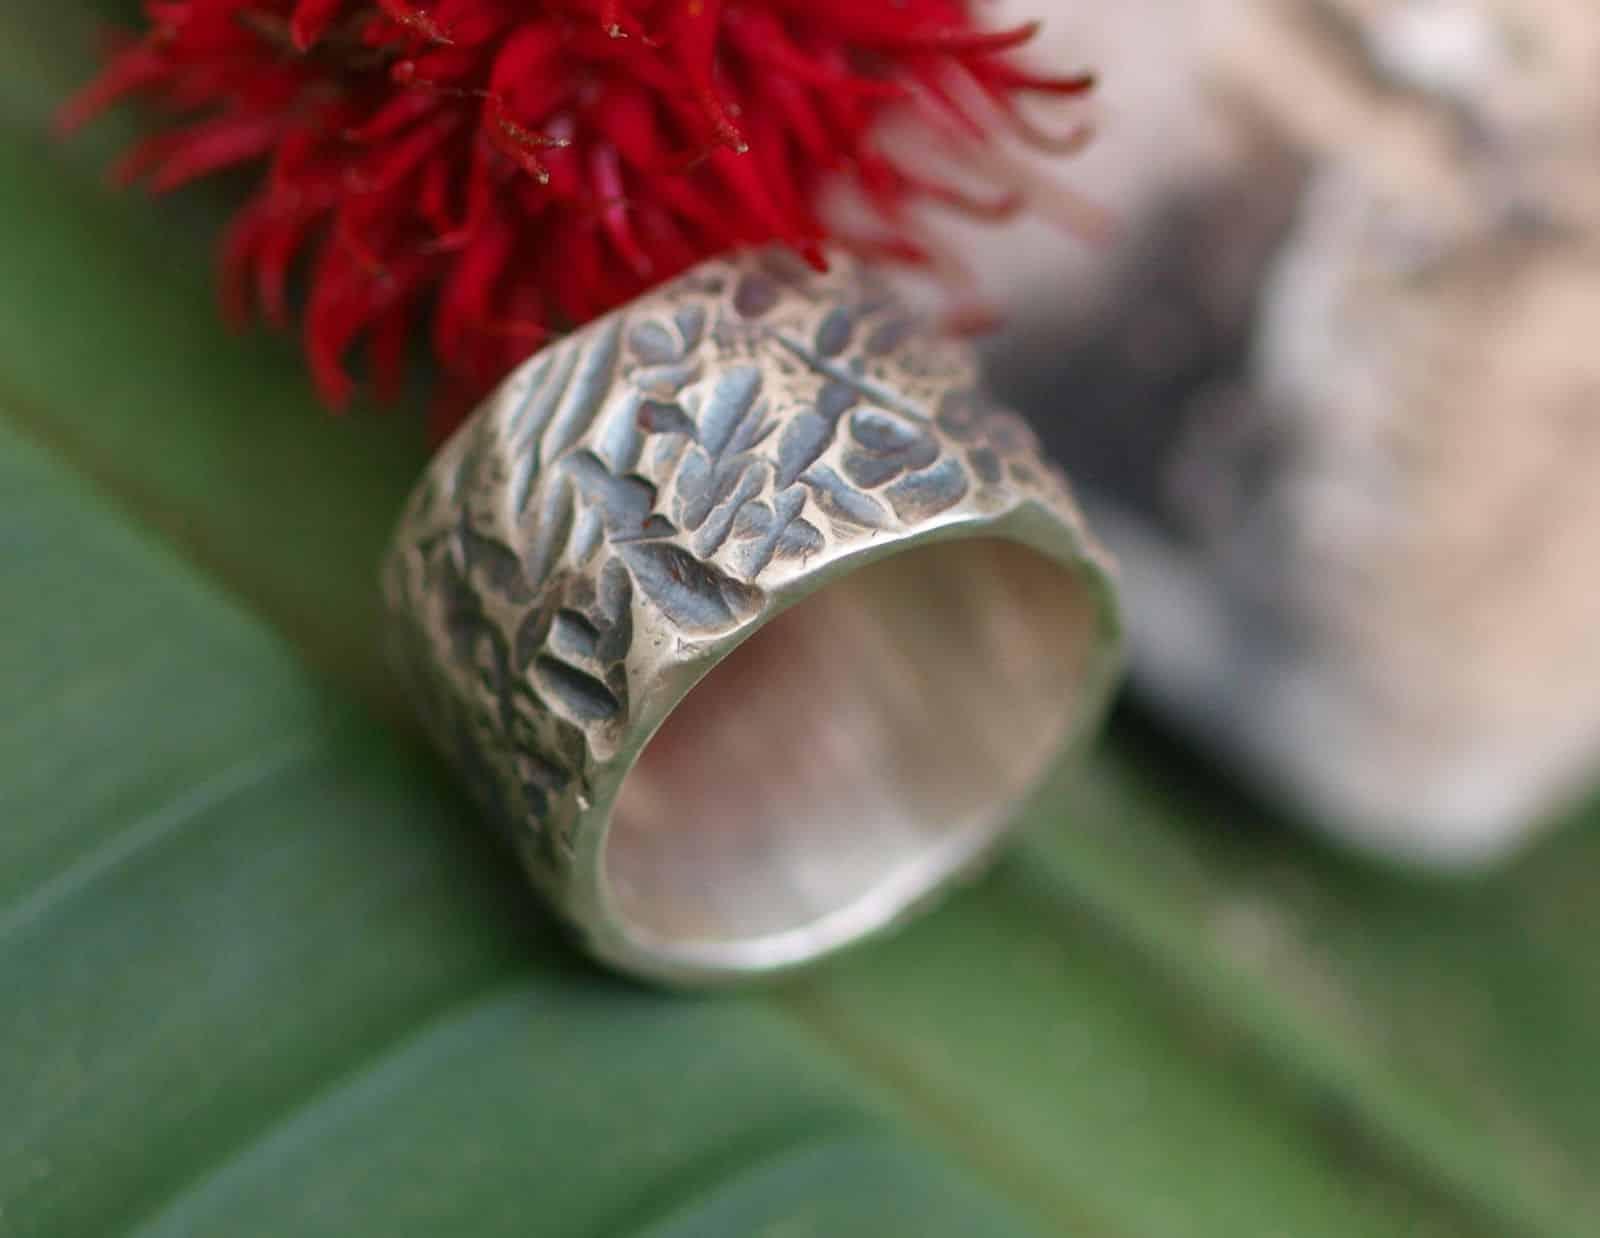 Unikat Ring Silber 925 grob geschmiedet mit Strukturen breit